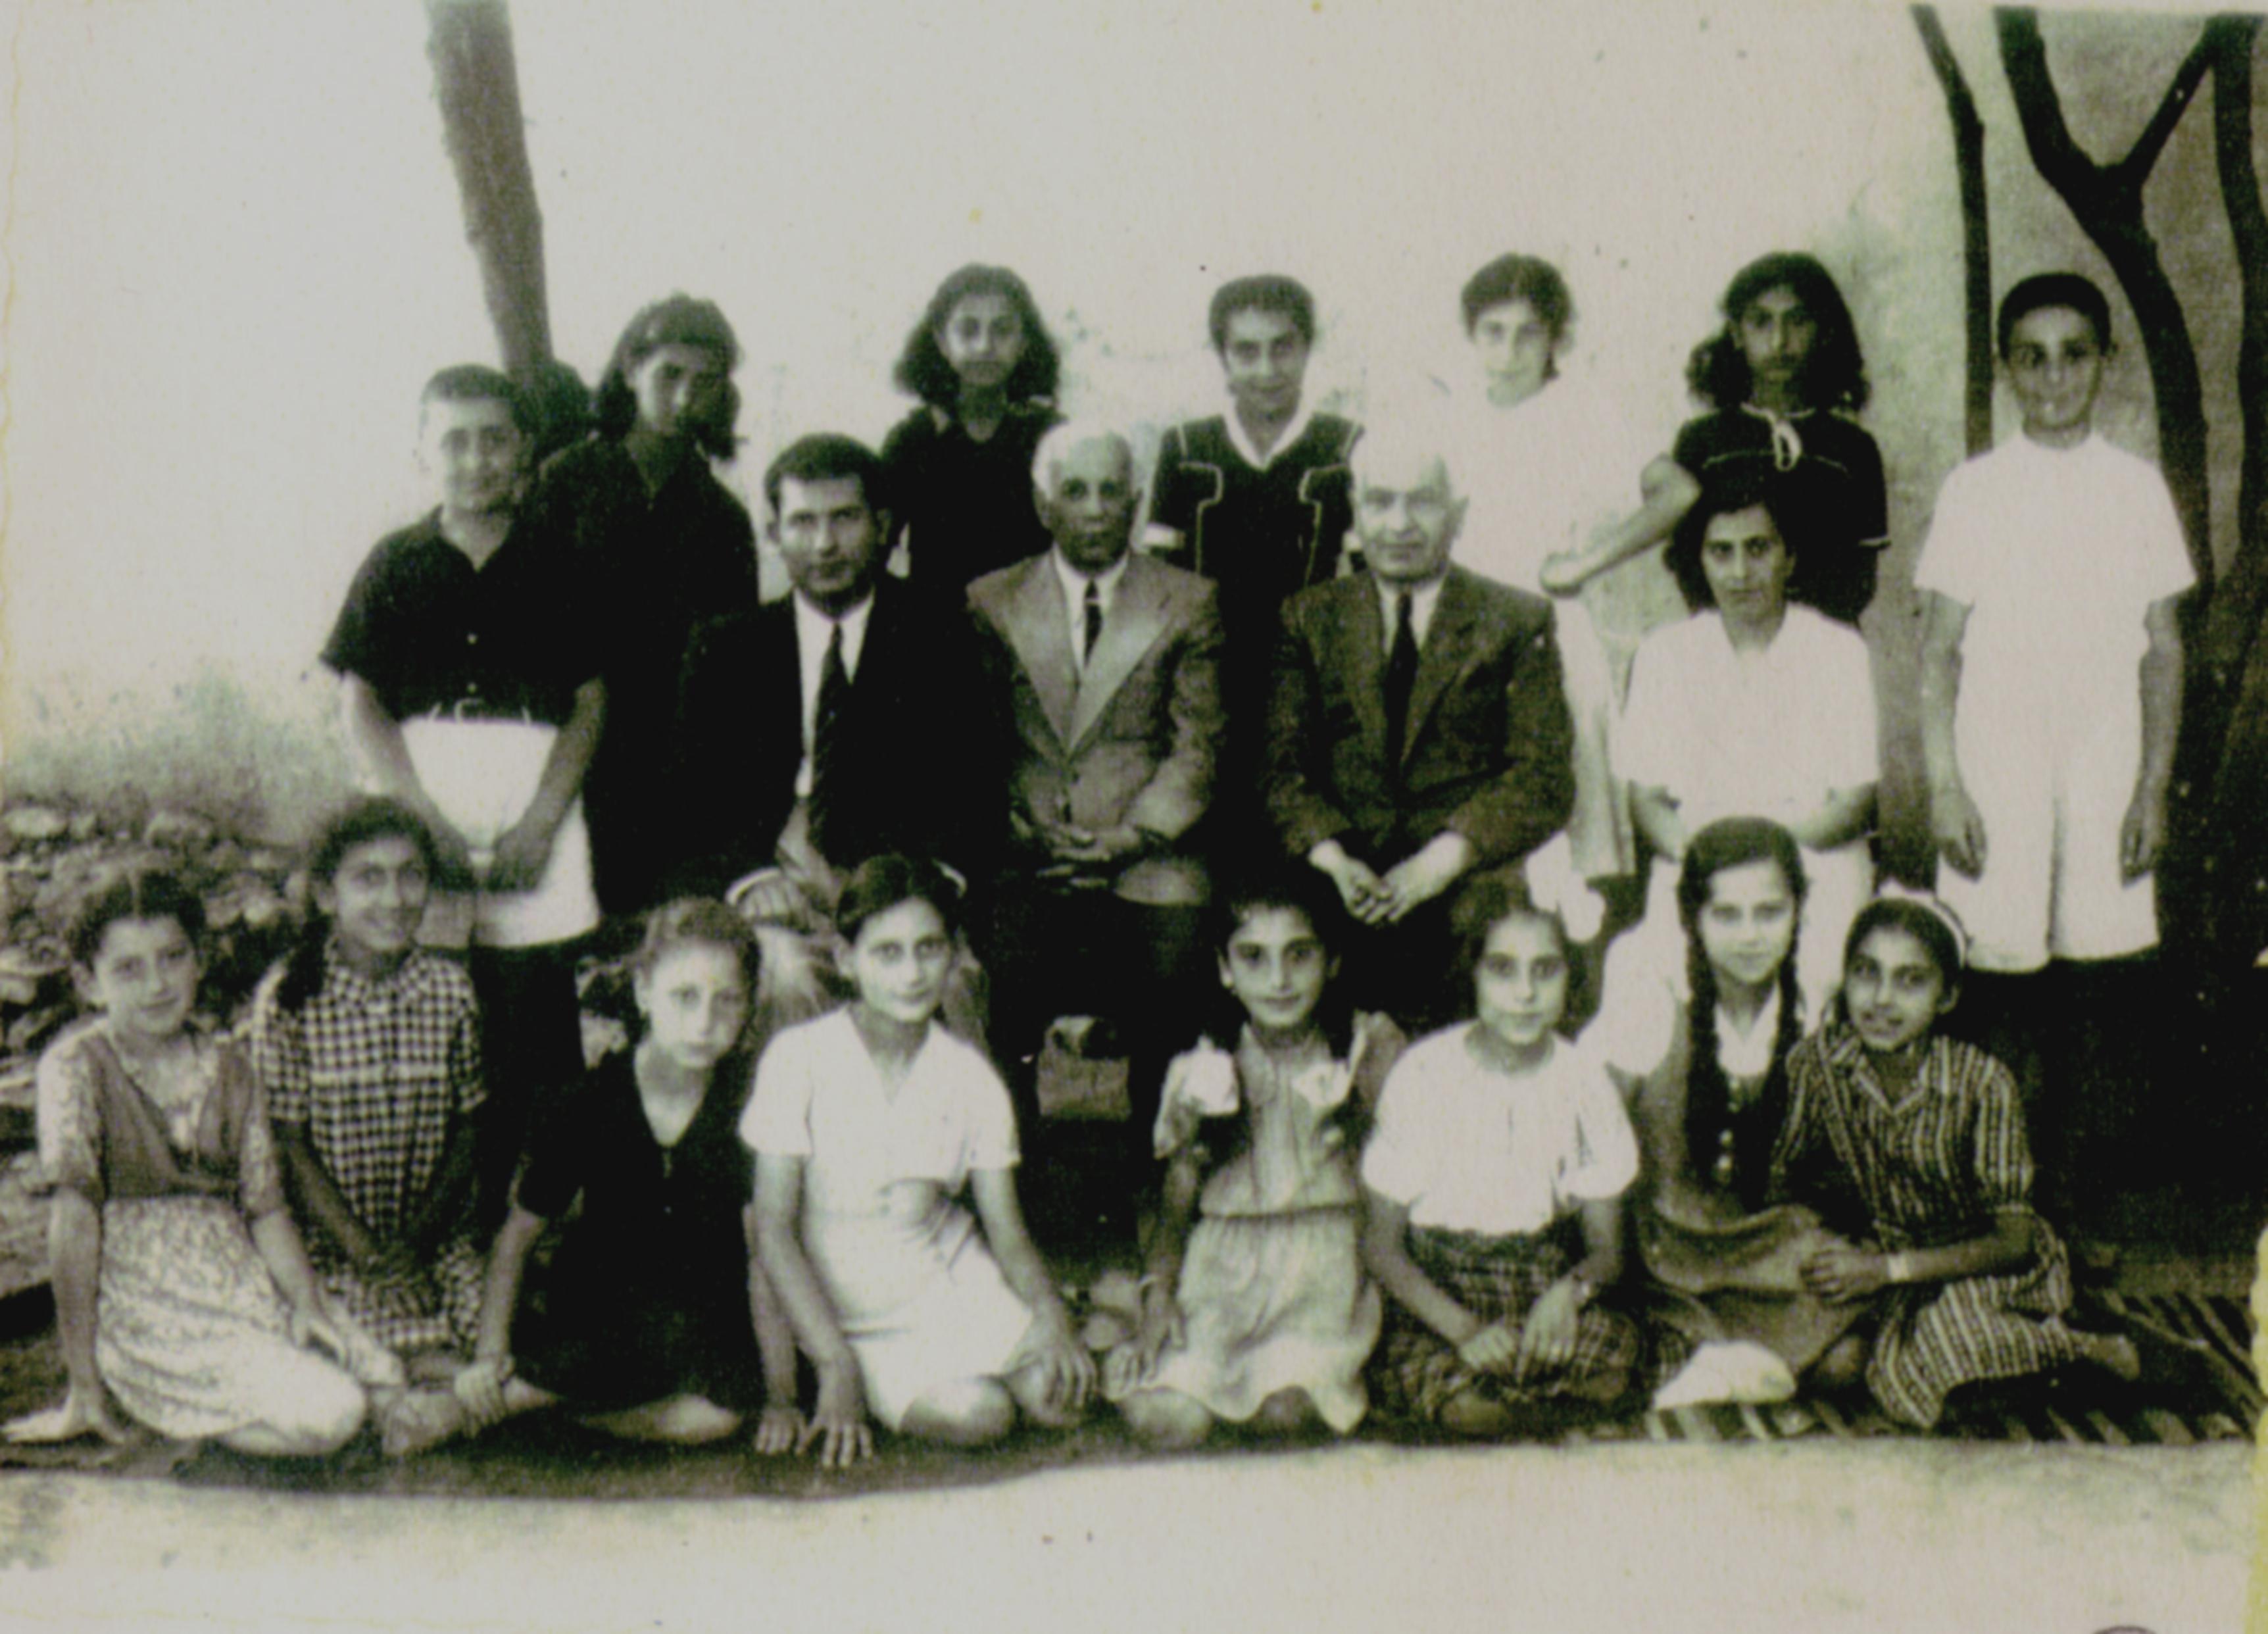 Cozighian in stinga fotografiei linga profesorul Capriel Kiregian. Ceilalti doi profesori sunt Kricor Nișanian și Vartanian.